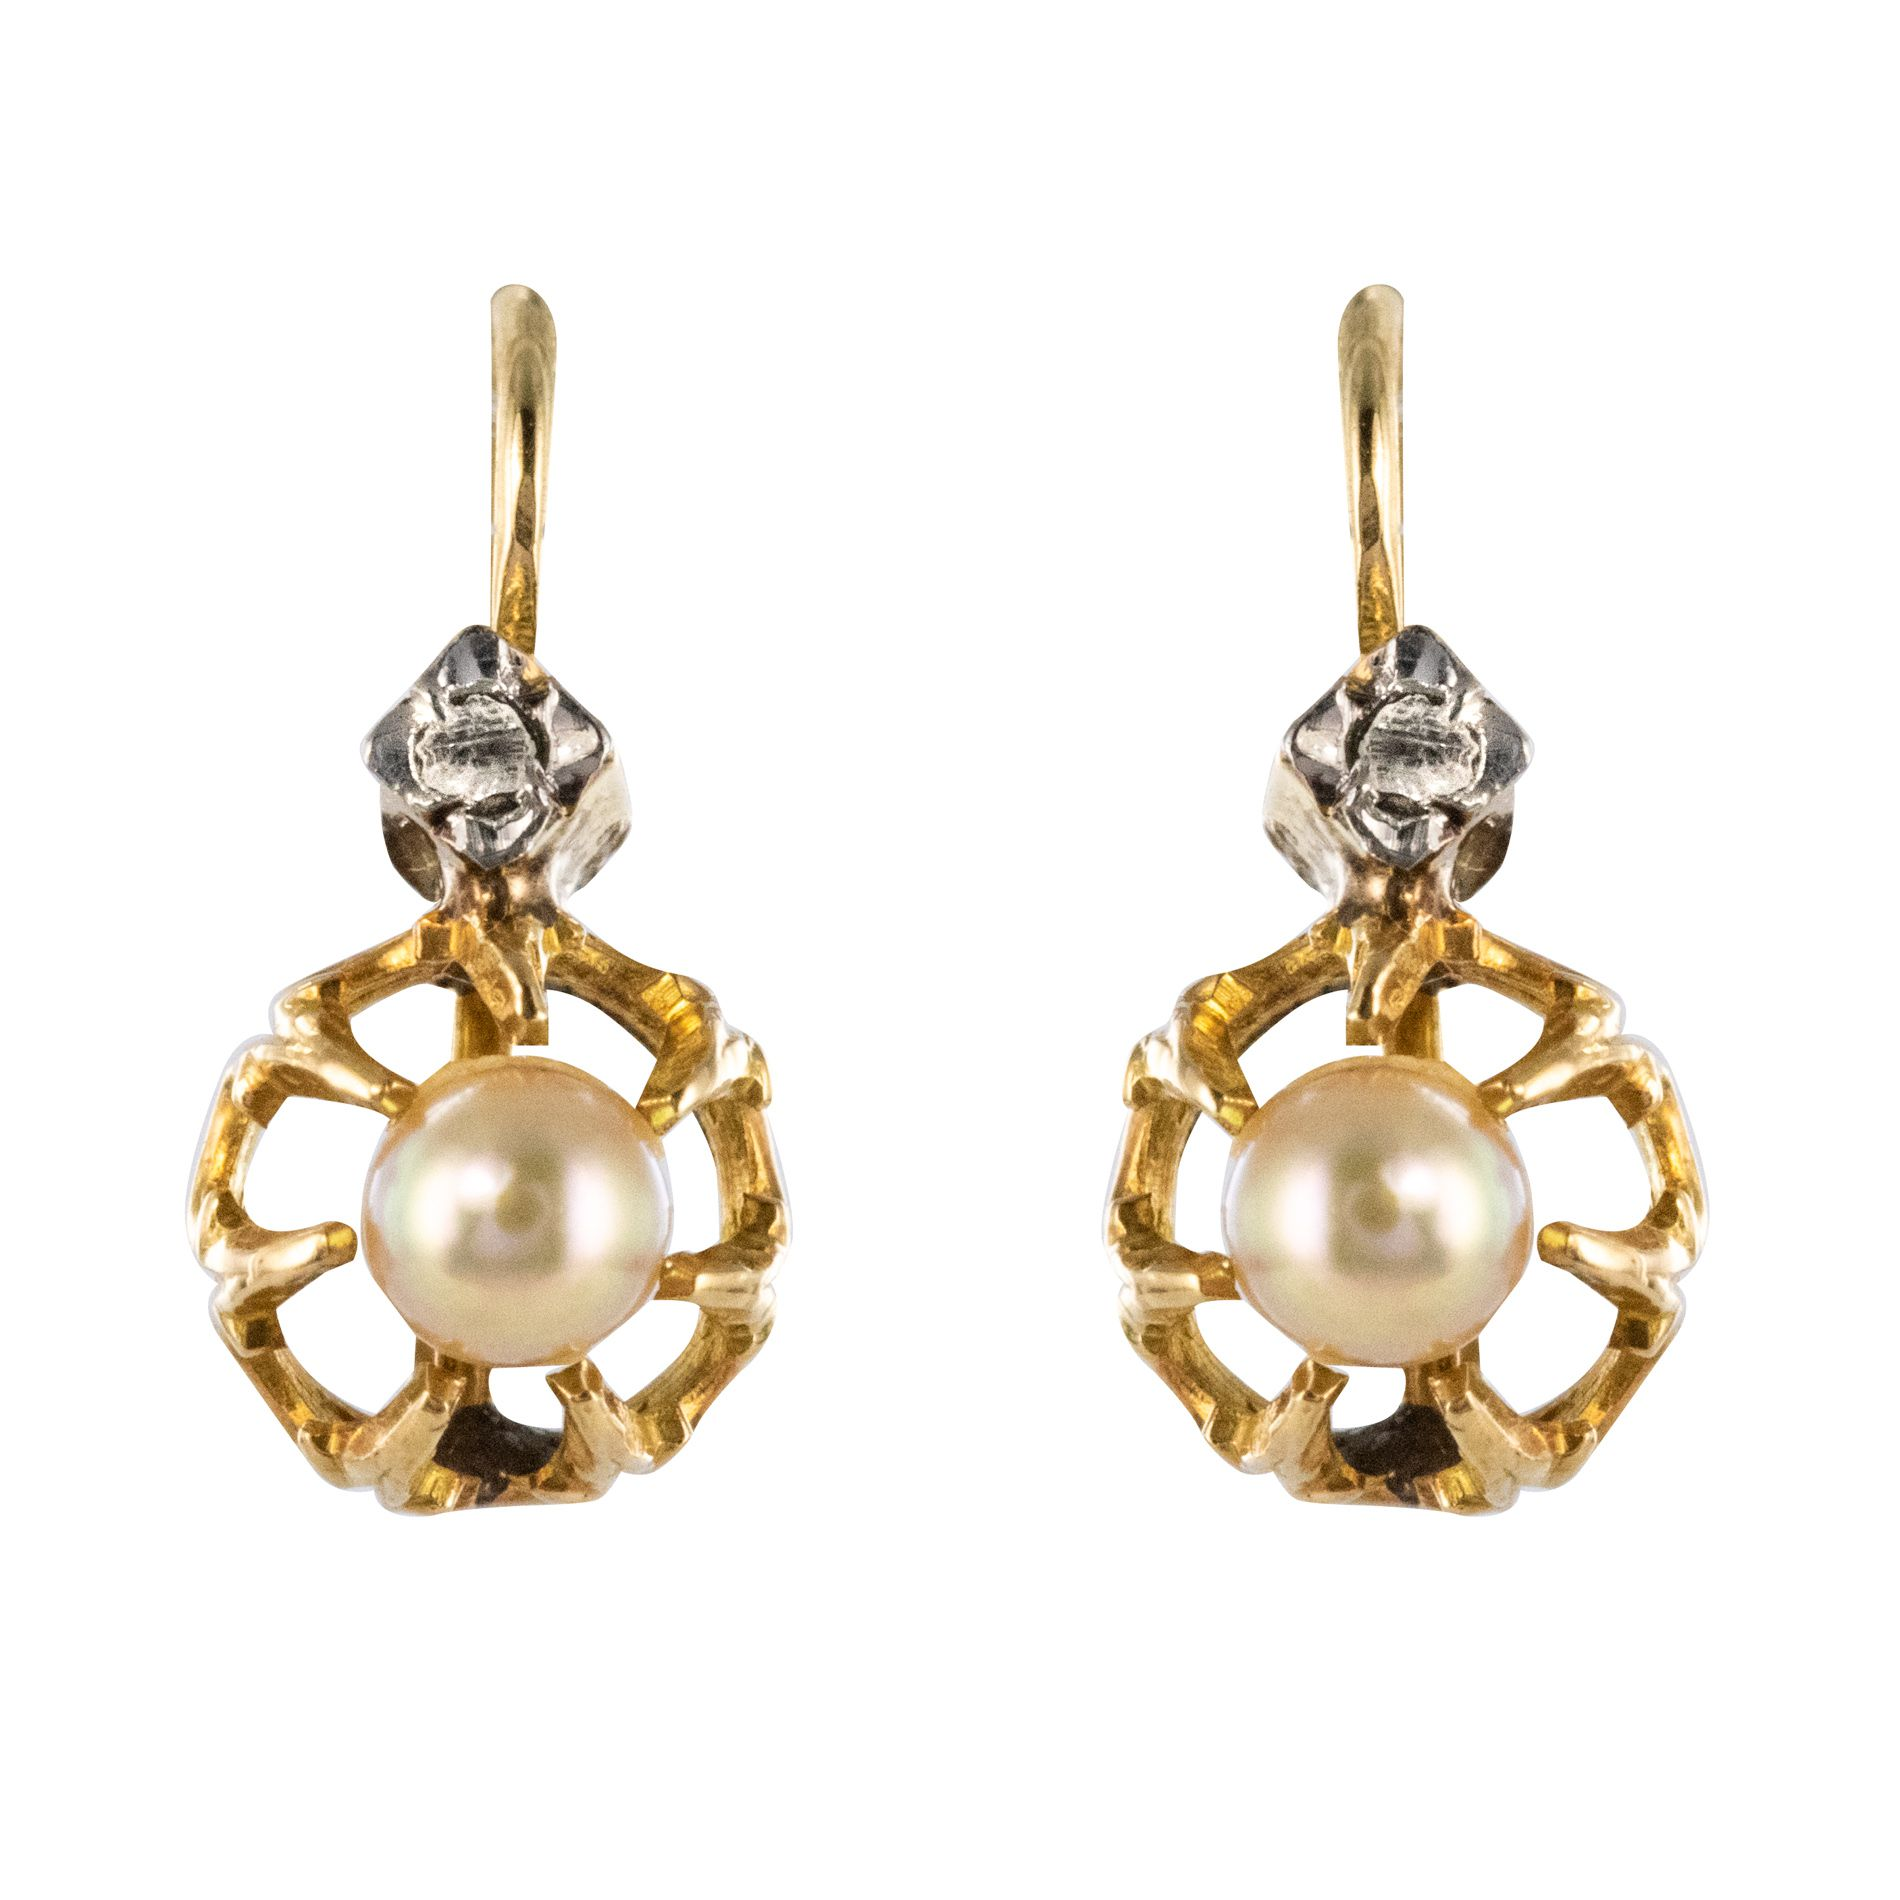 Dormeuses anciennes perles diamants